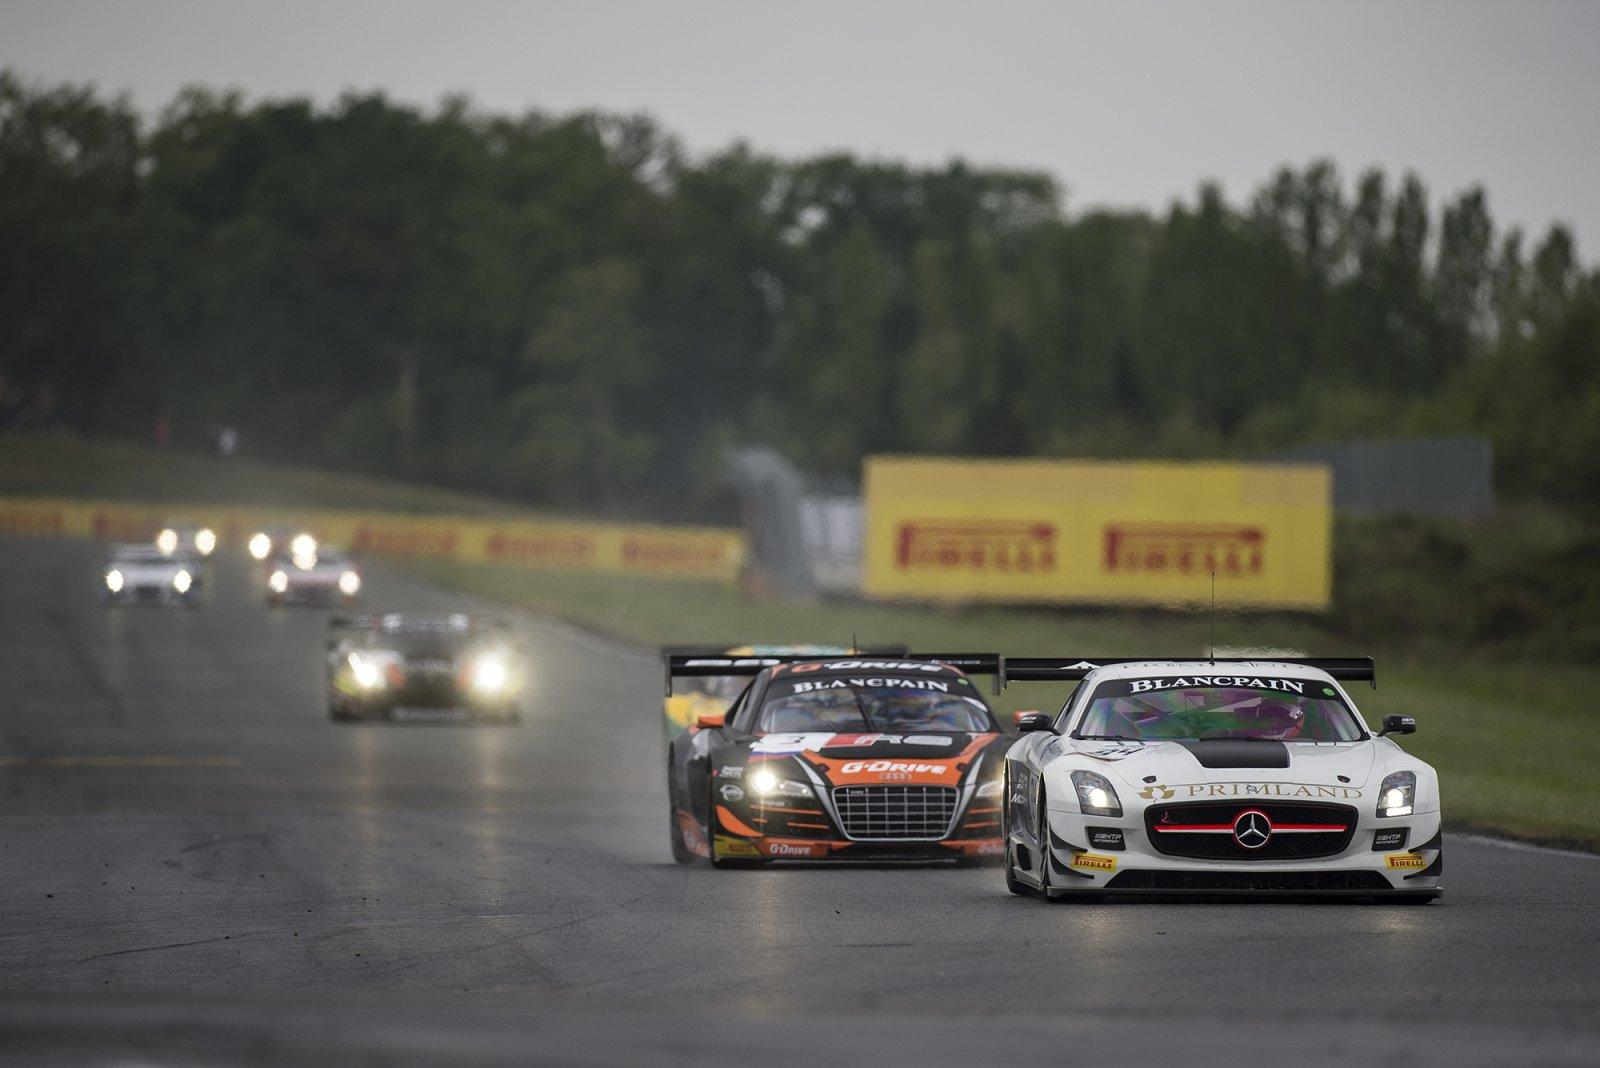 Breaking news - Nogaro Main Race - Buhk and Götz win first Main Race of 2014 Blancpain Sprint Series